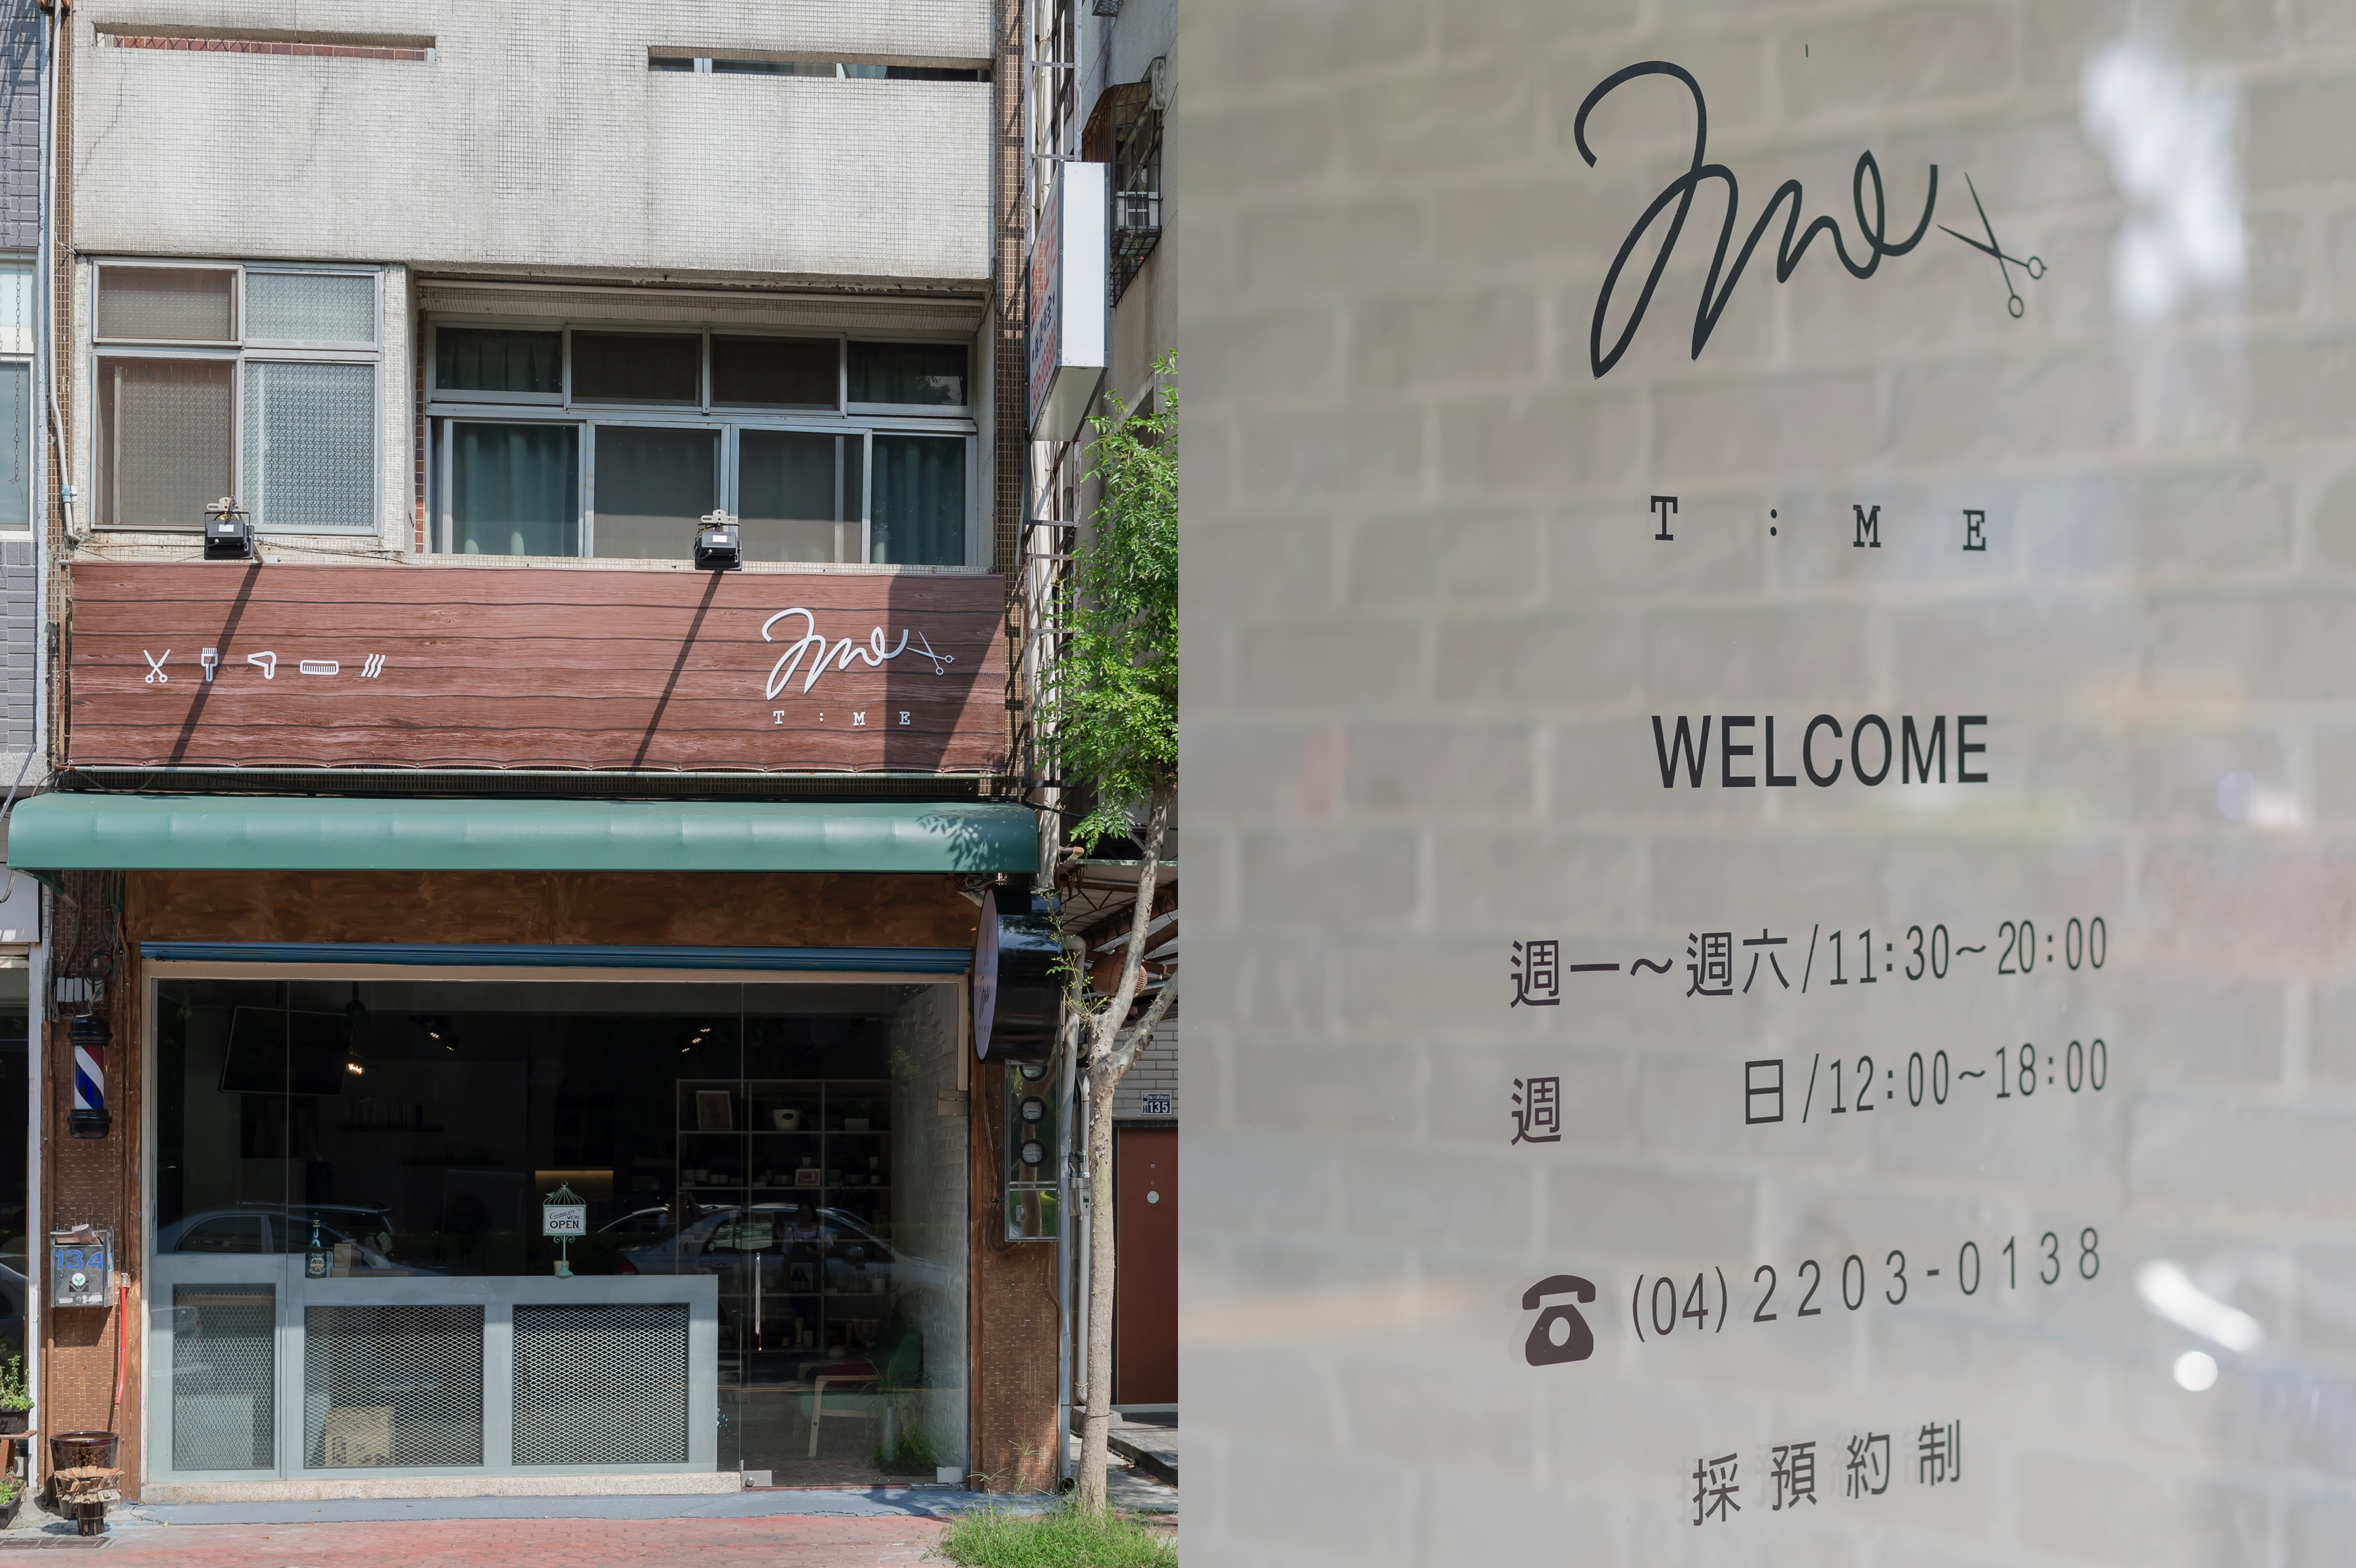 metime髮型設計空間攝影阿宏精選_02-2